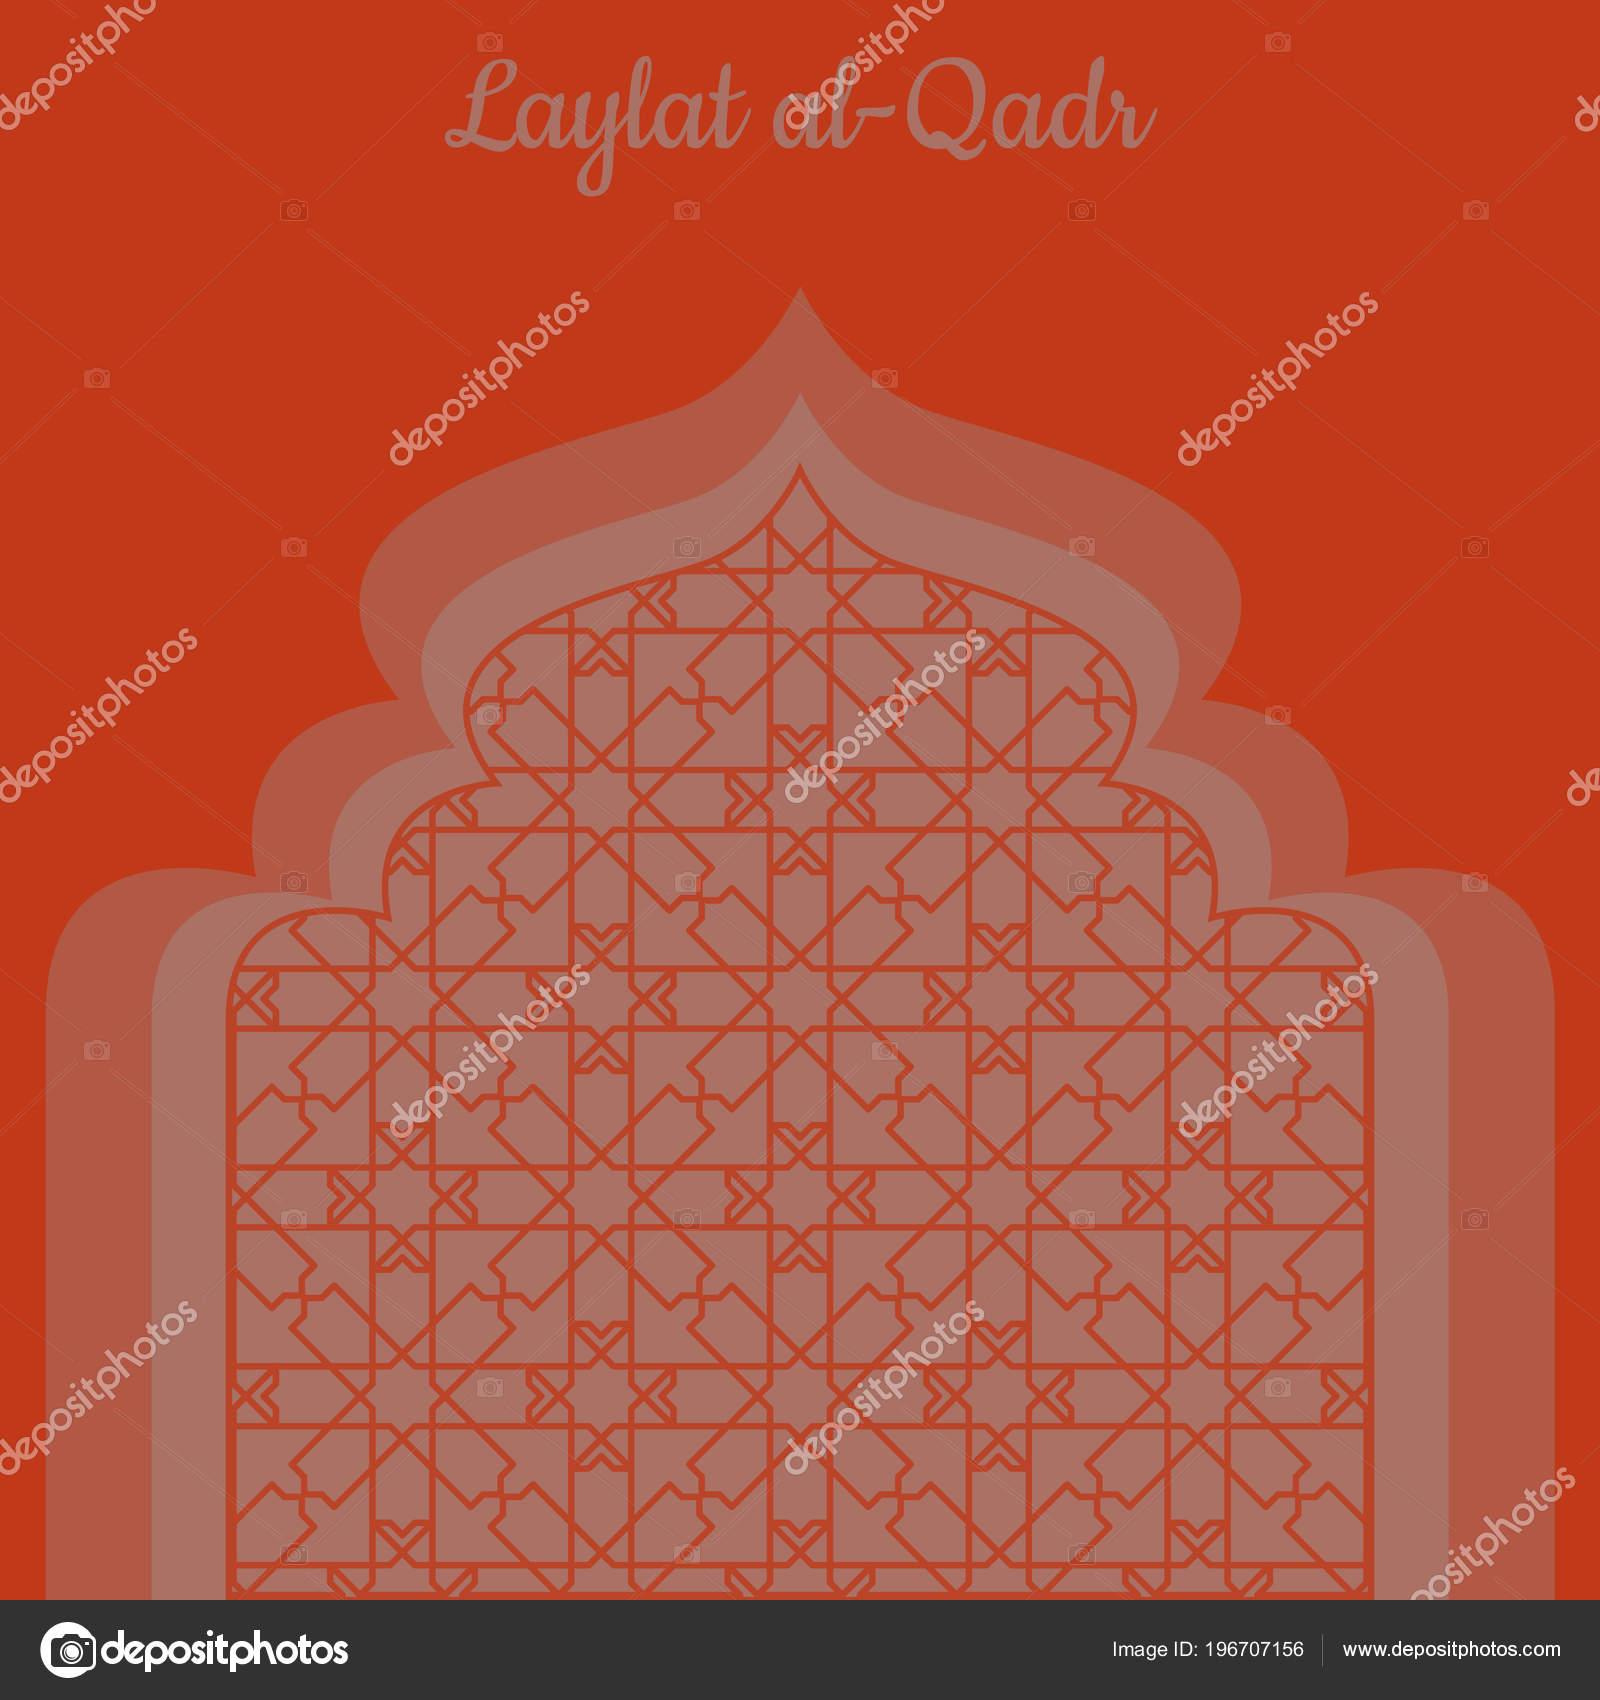 Laylat Qadr Concept Islamic Religion Holiday Symbolic Silhouette